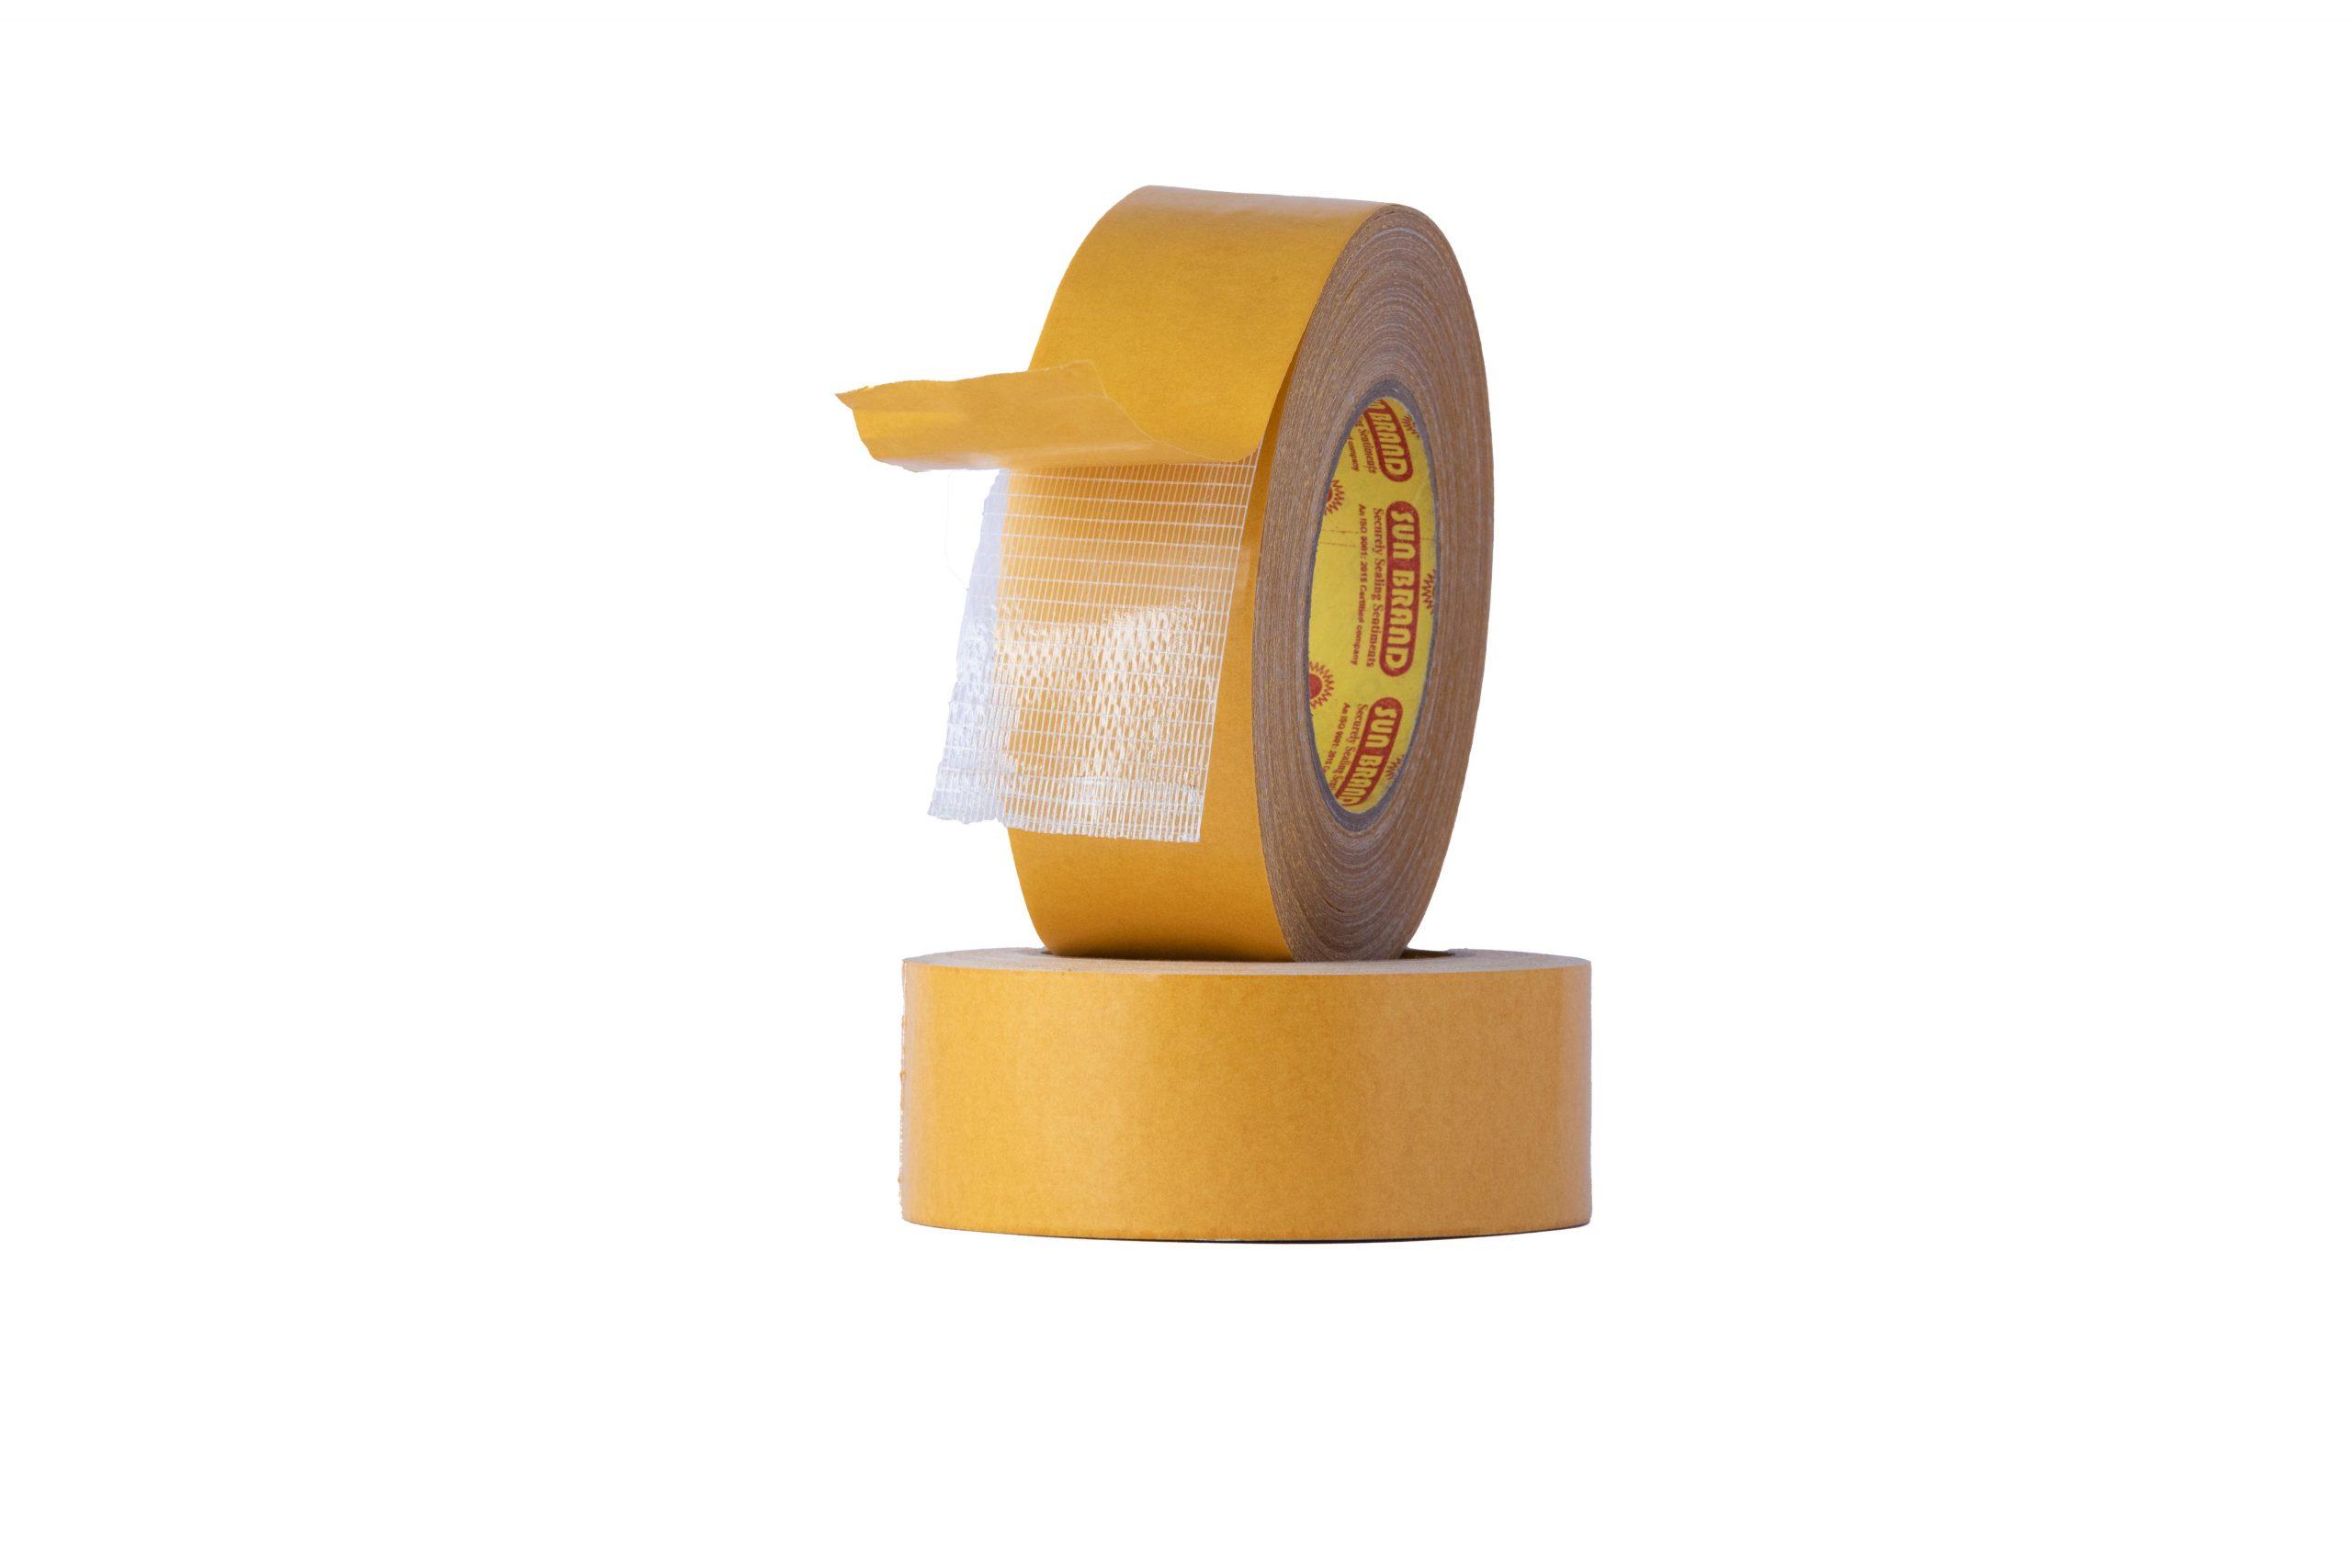 D/s Cross Filament Tape